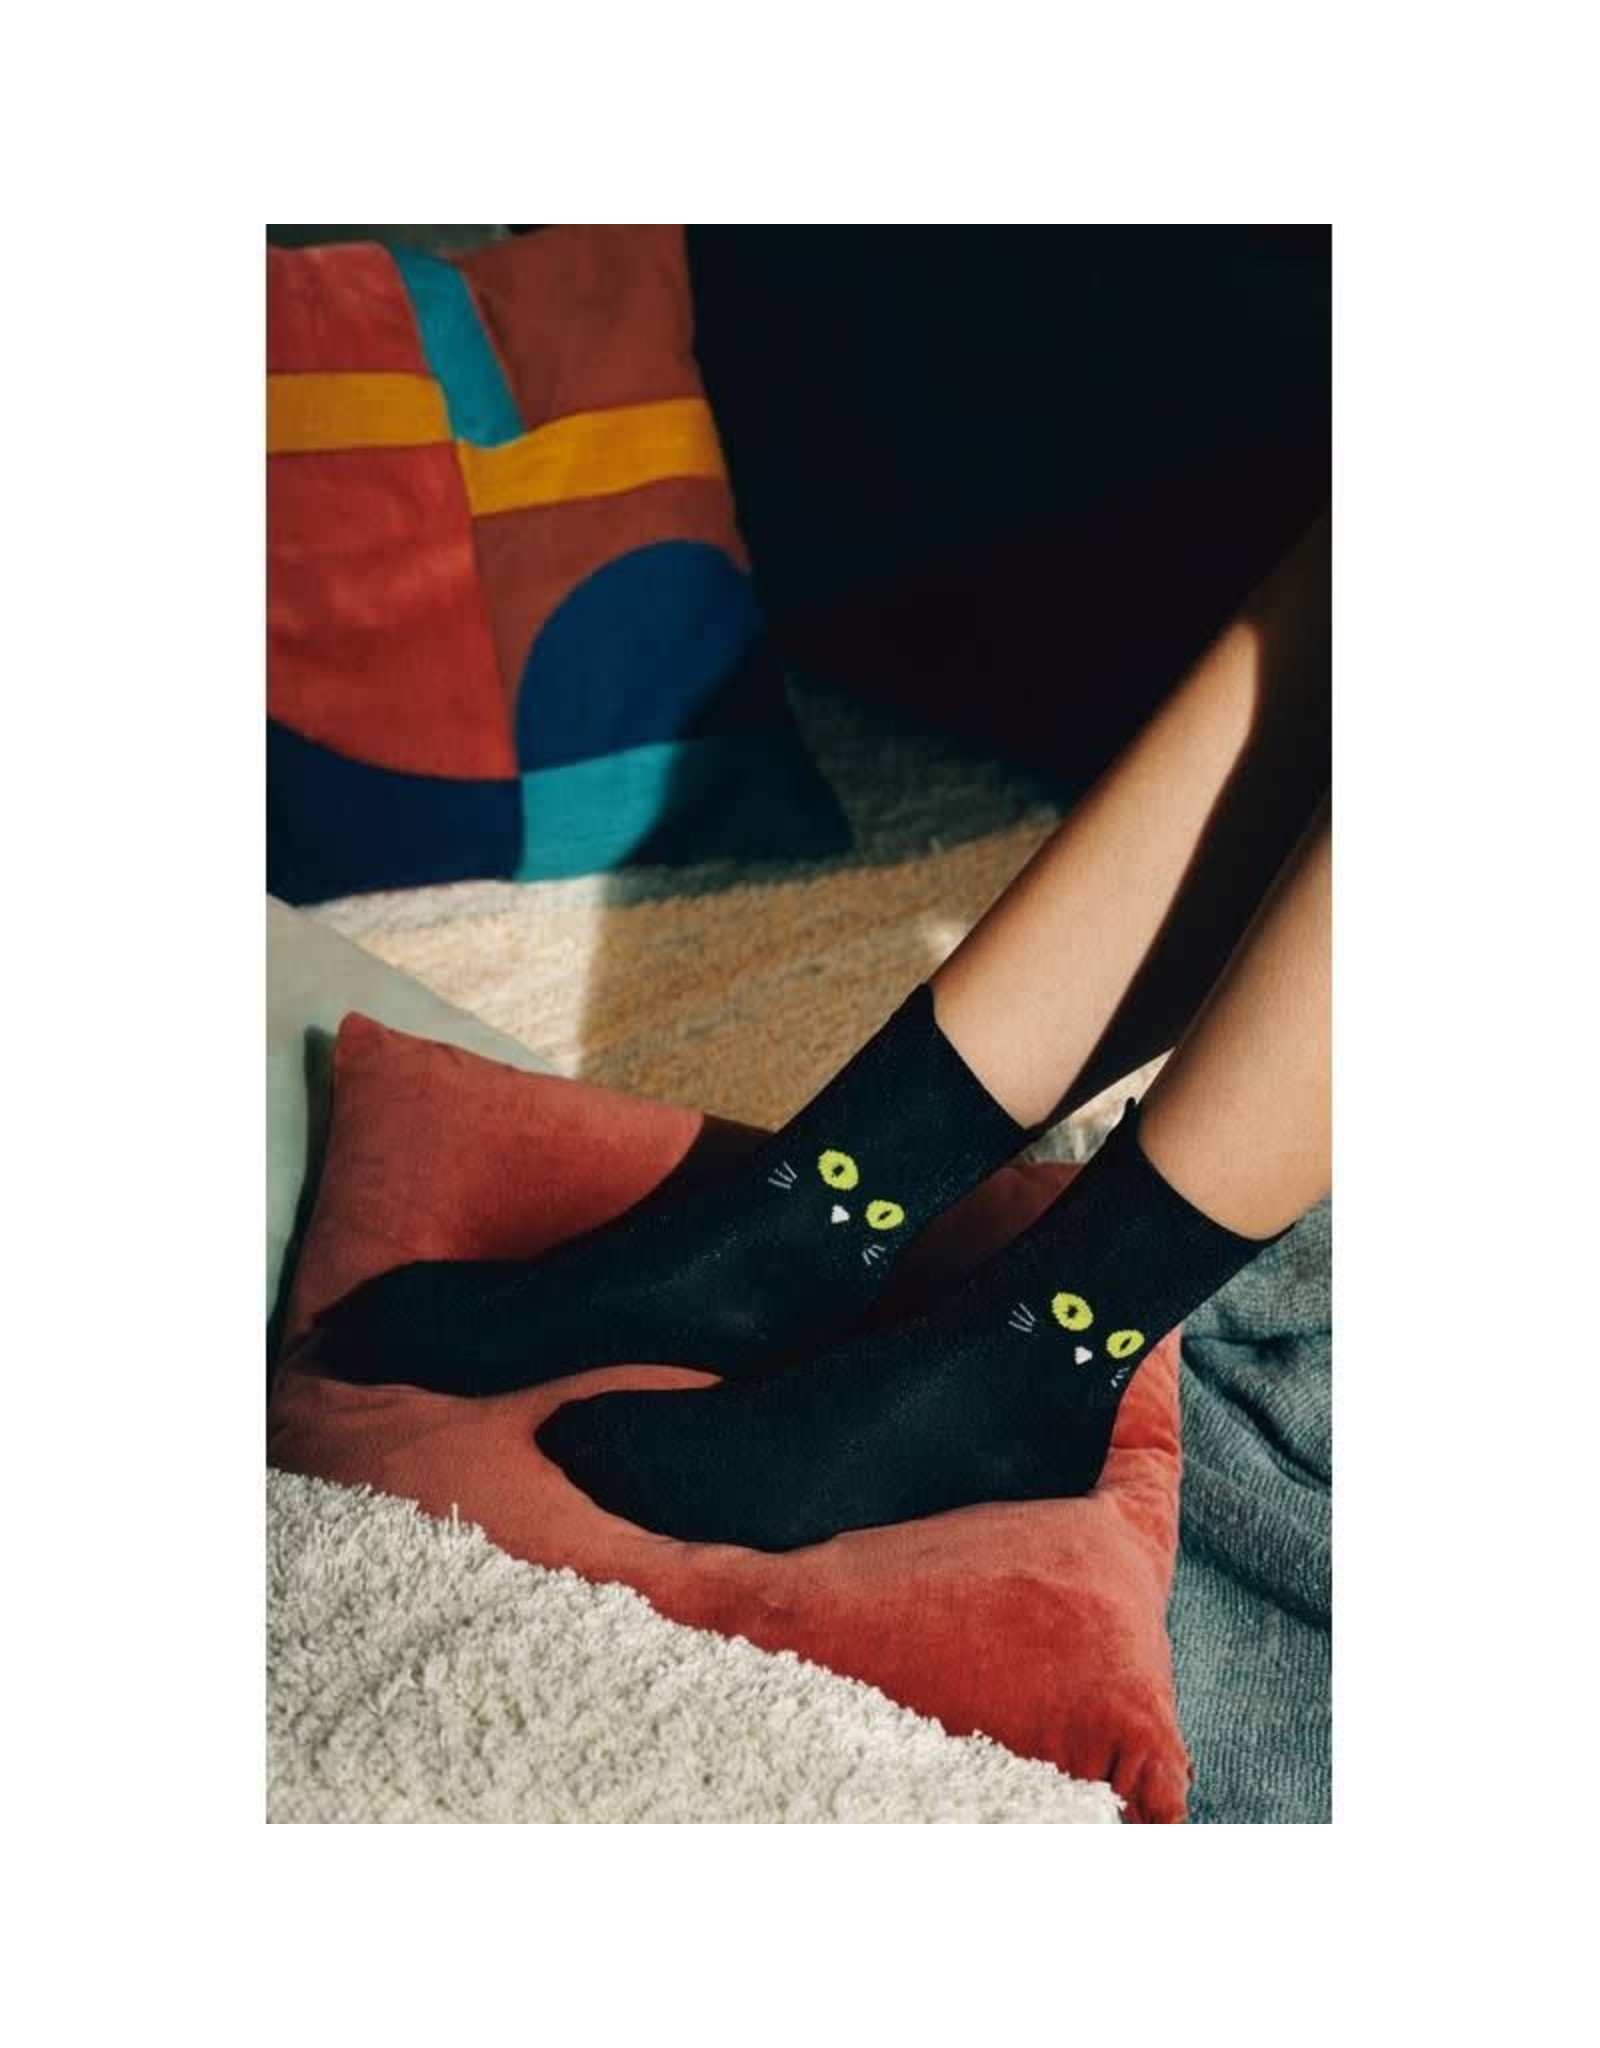 socks with cat design